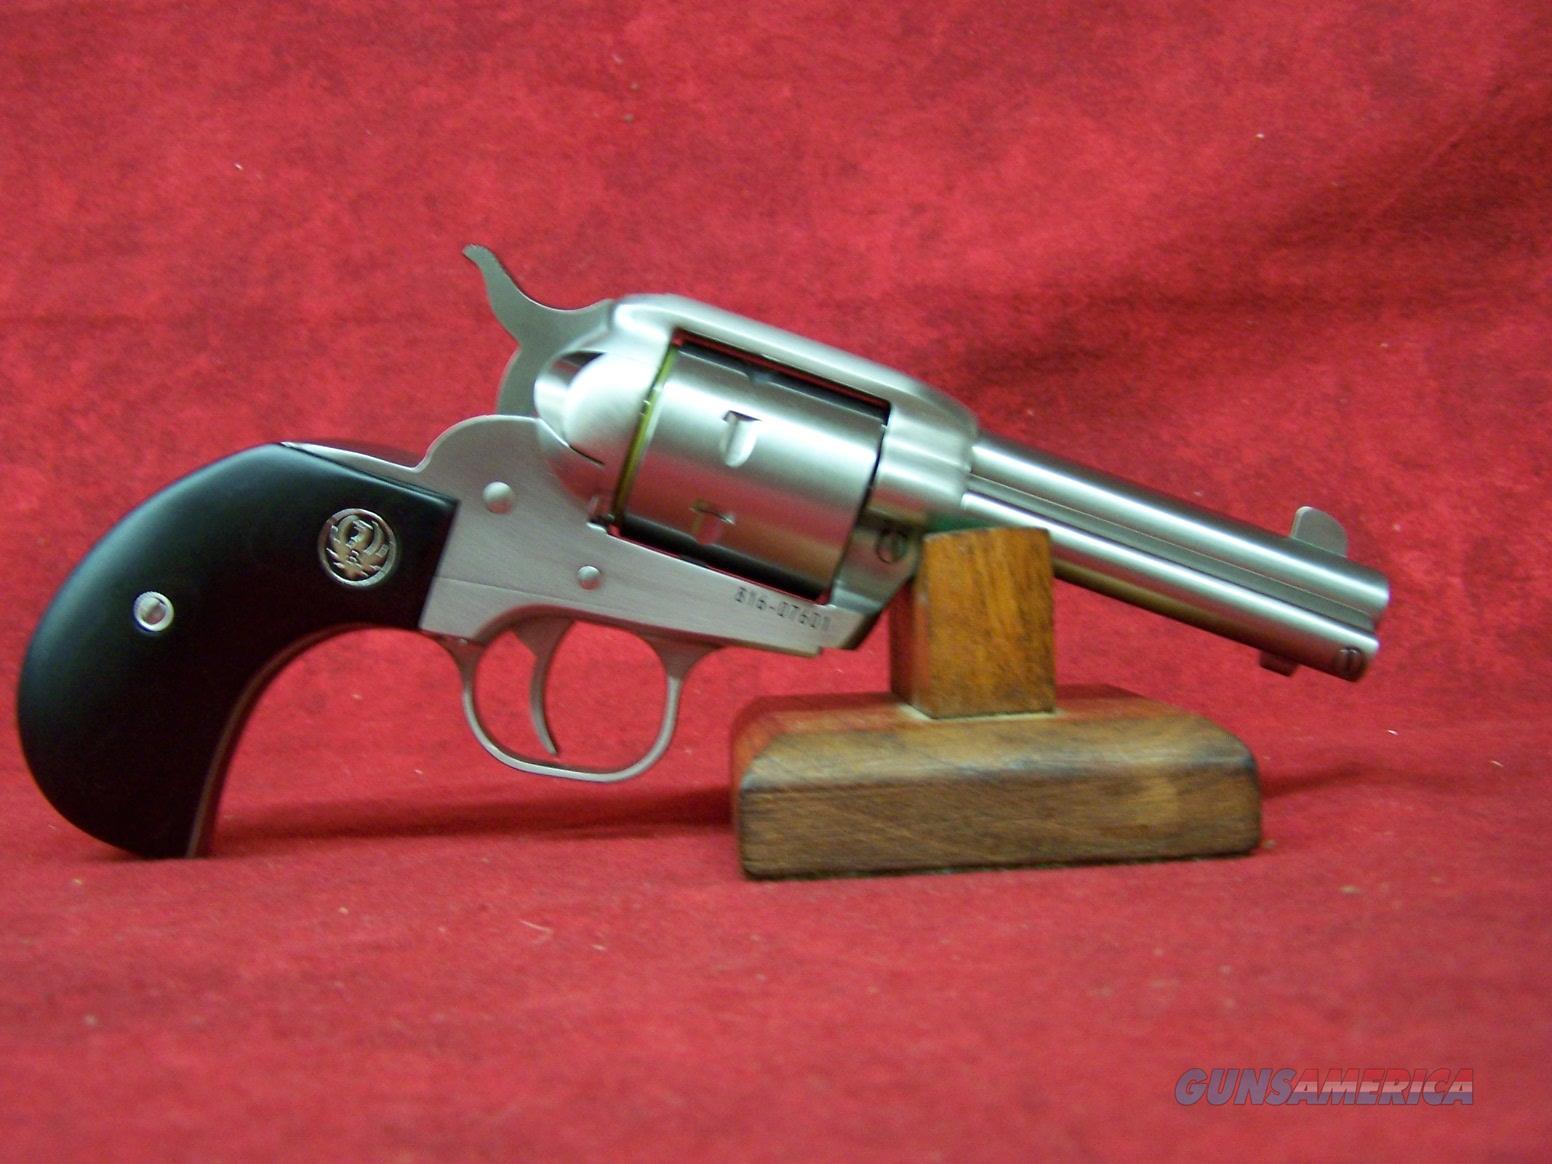 "Ruger Single Seven Birdshead 327 Fed Mag 3-3/4"" SS Barrel (08163)  Guns > Pistols > Ruger Single Action Revolvers > Single Six Type"